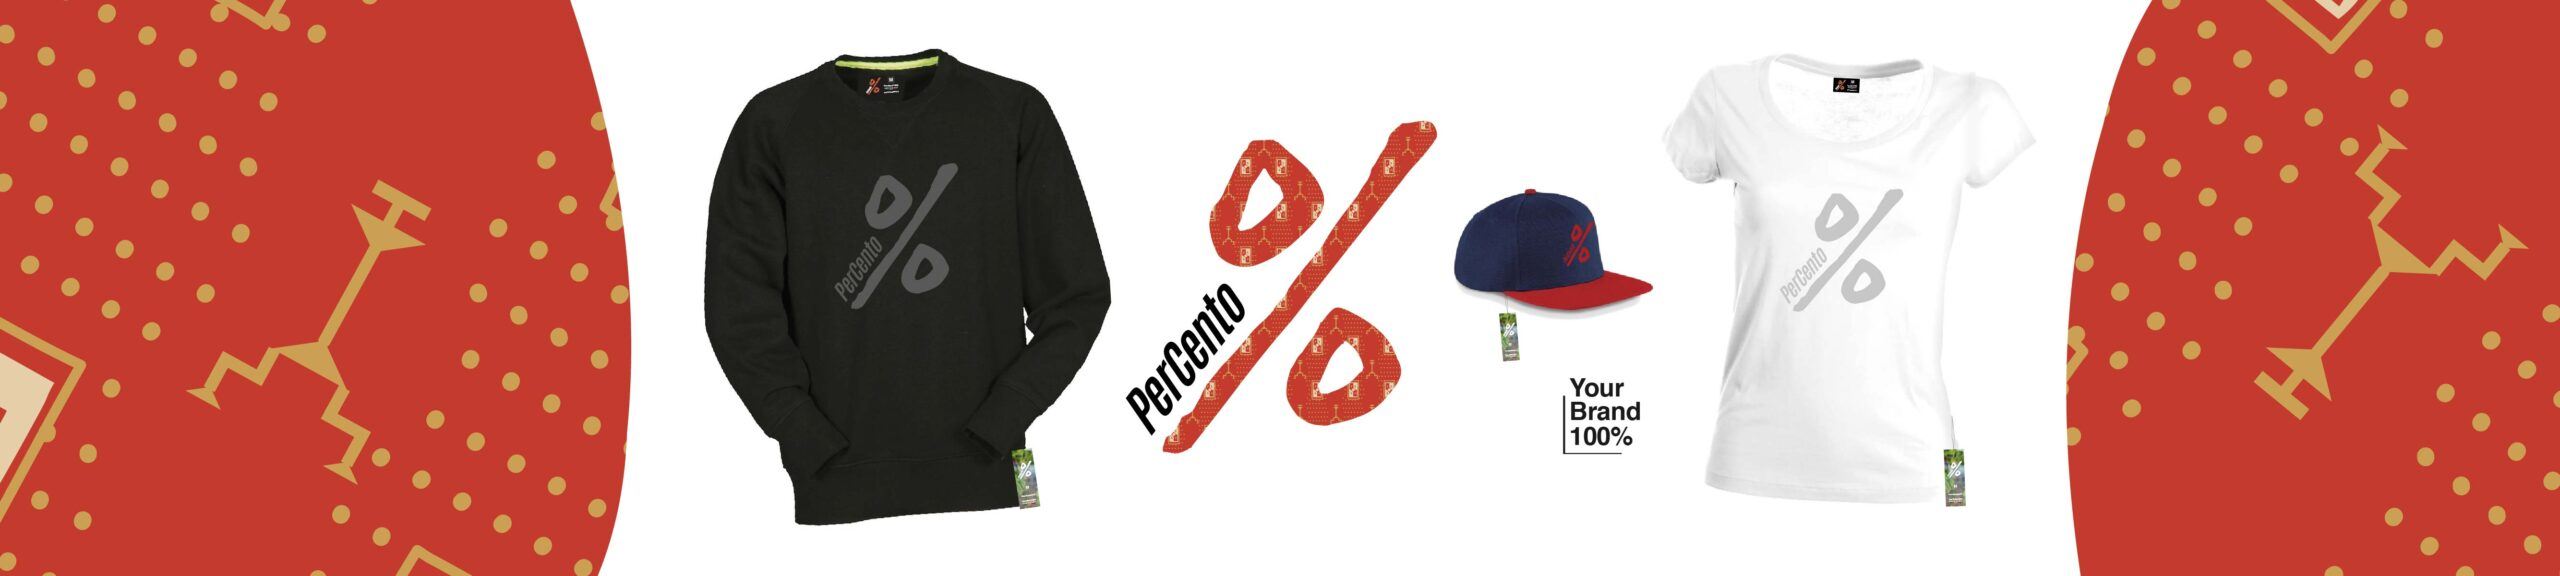 PerCento - your brand 100%